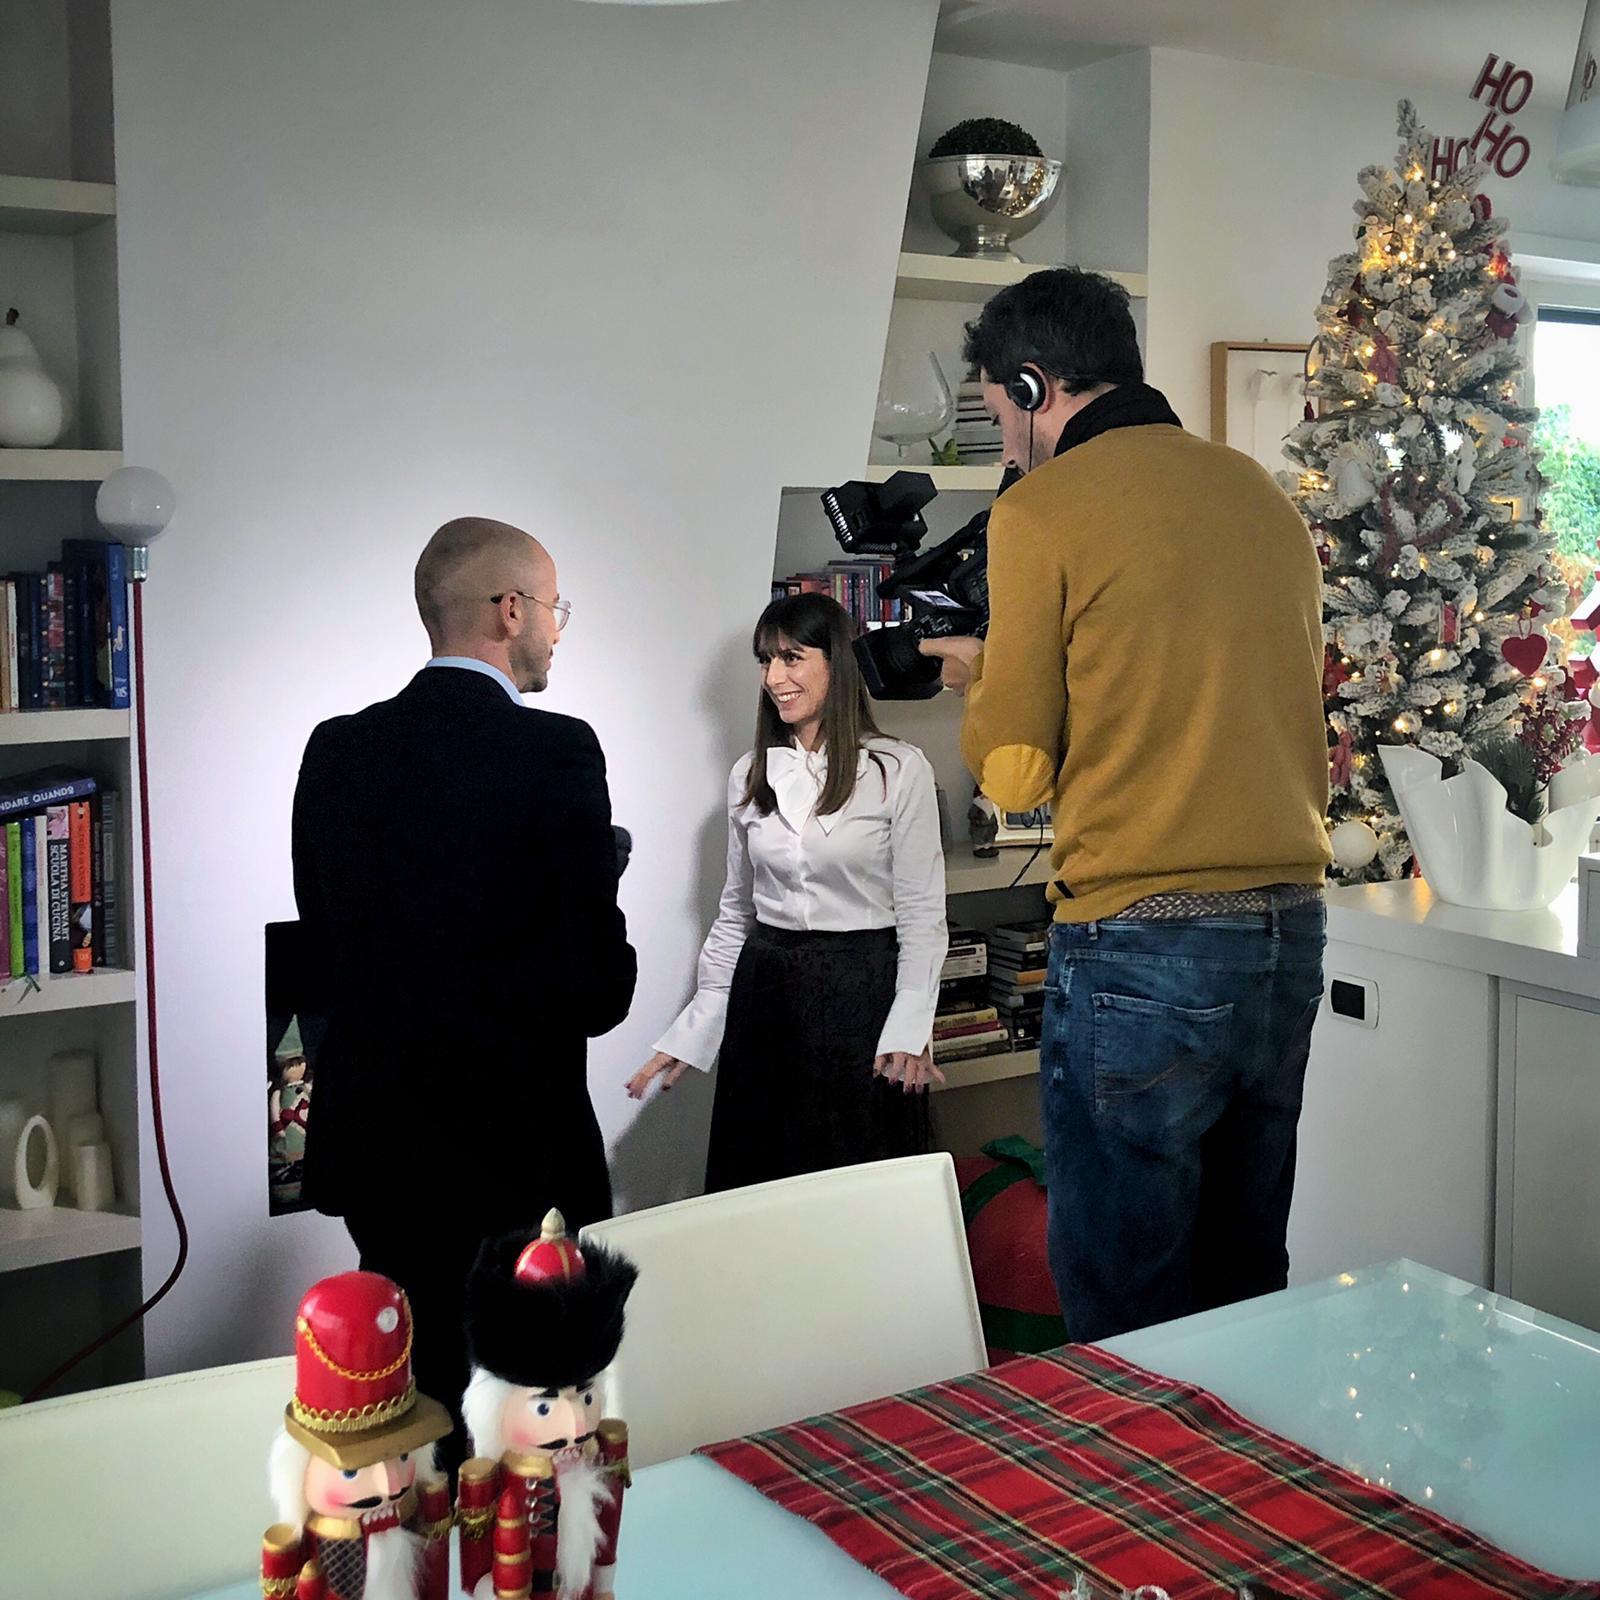 Intervista TG4 – Viviana Grunert - 20 Dicembre 2018